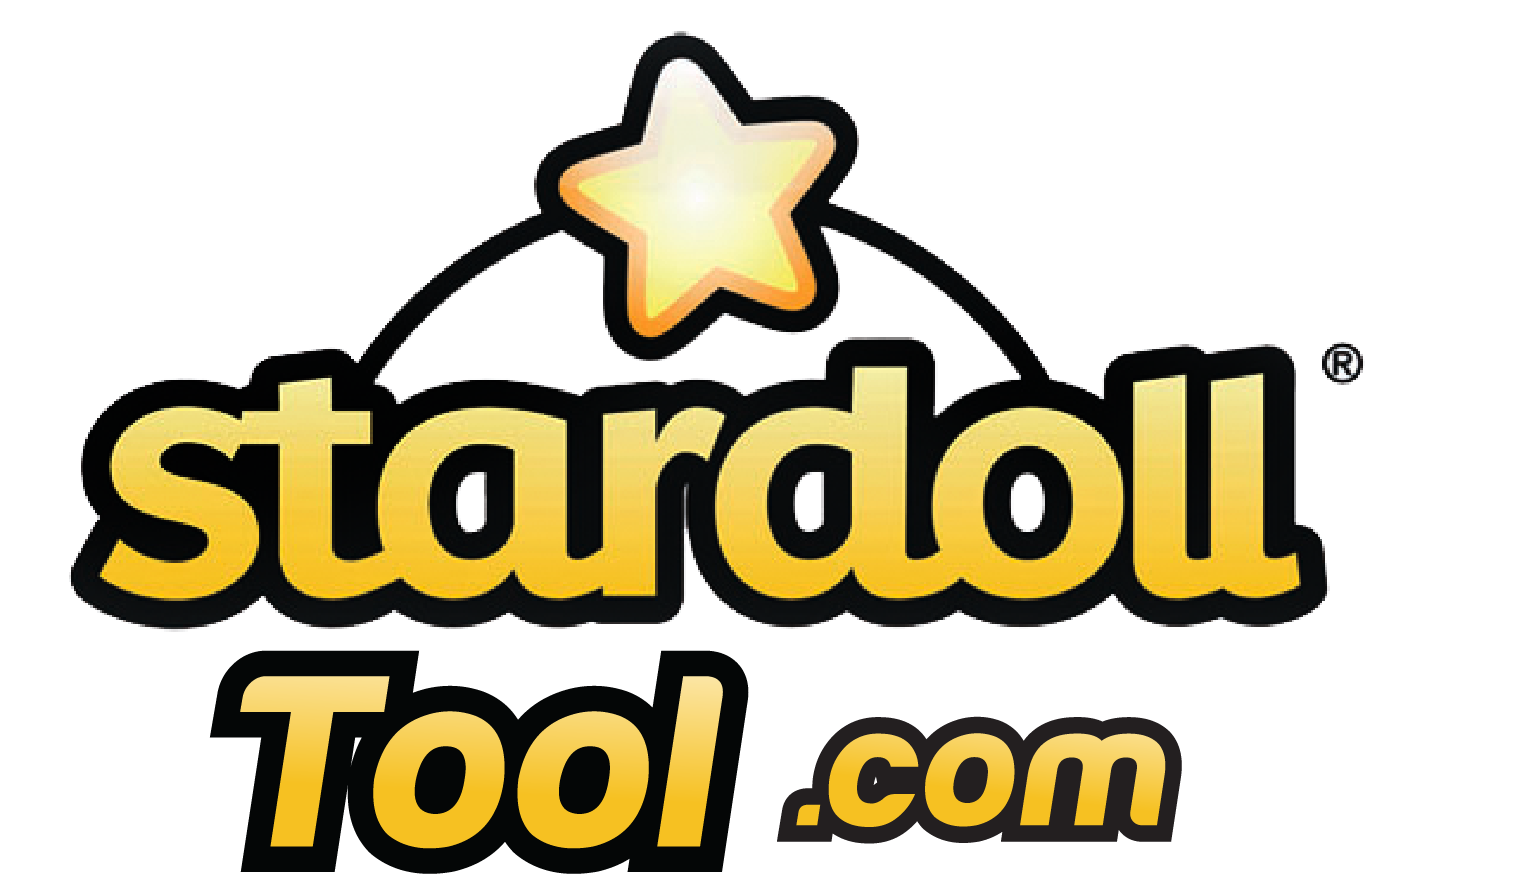 stardool-tool